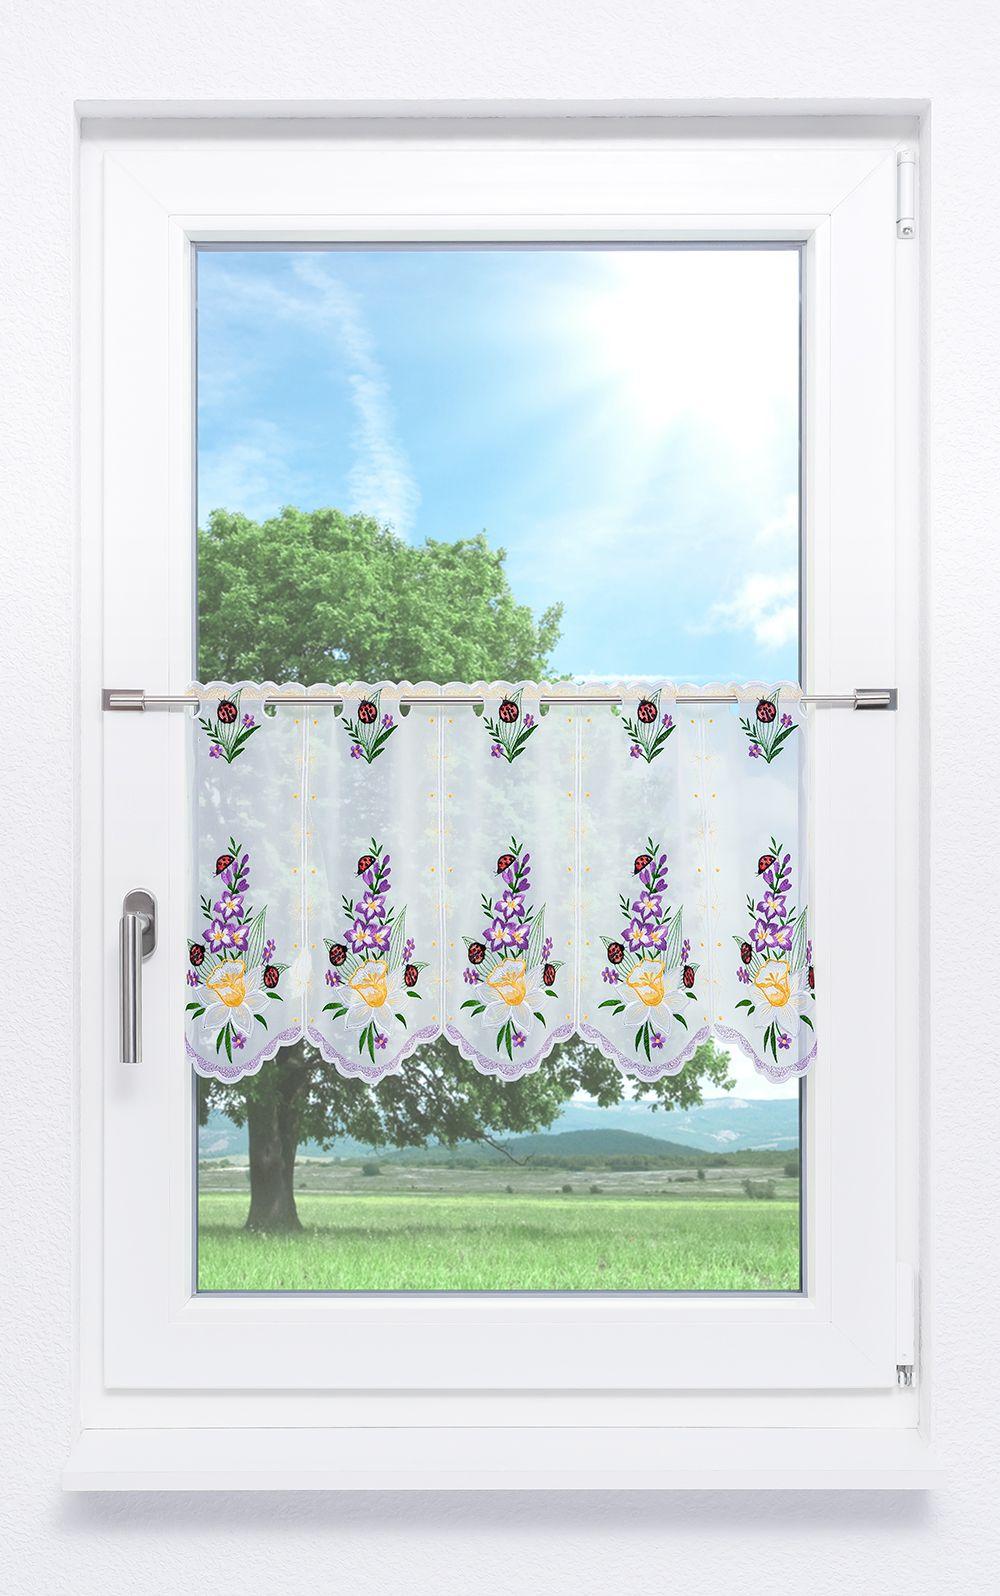 plauener spitze scheibengardinen fr hlingsblumen lila violett ebay. Black Bedroom Furniture Sets. Home Design Ideas